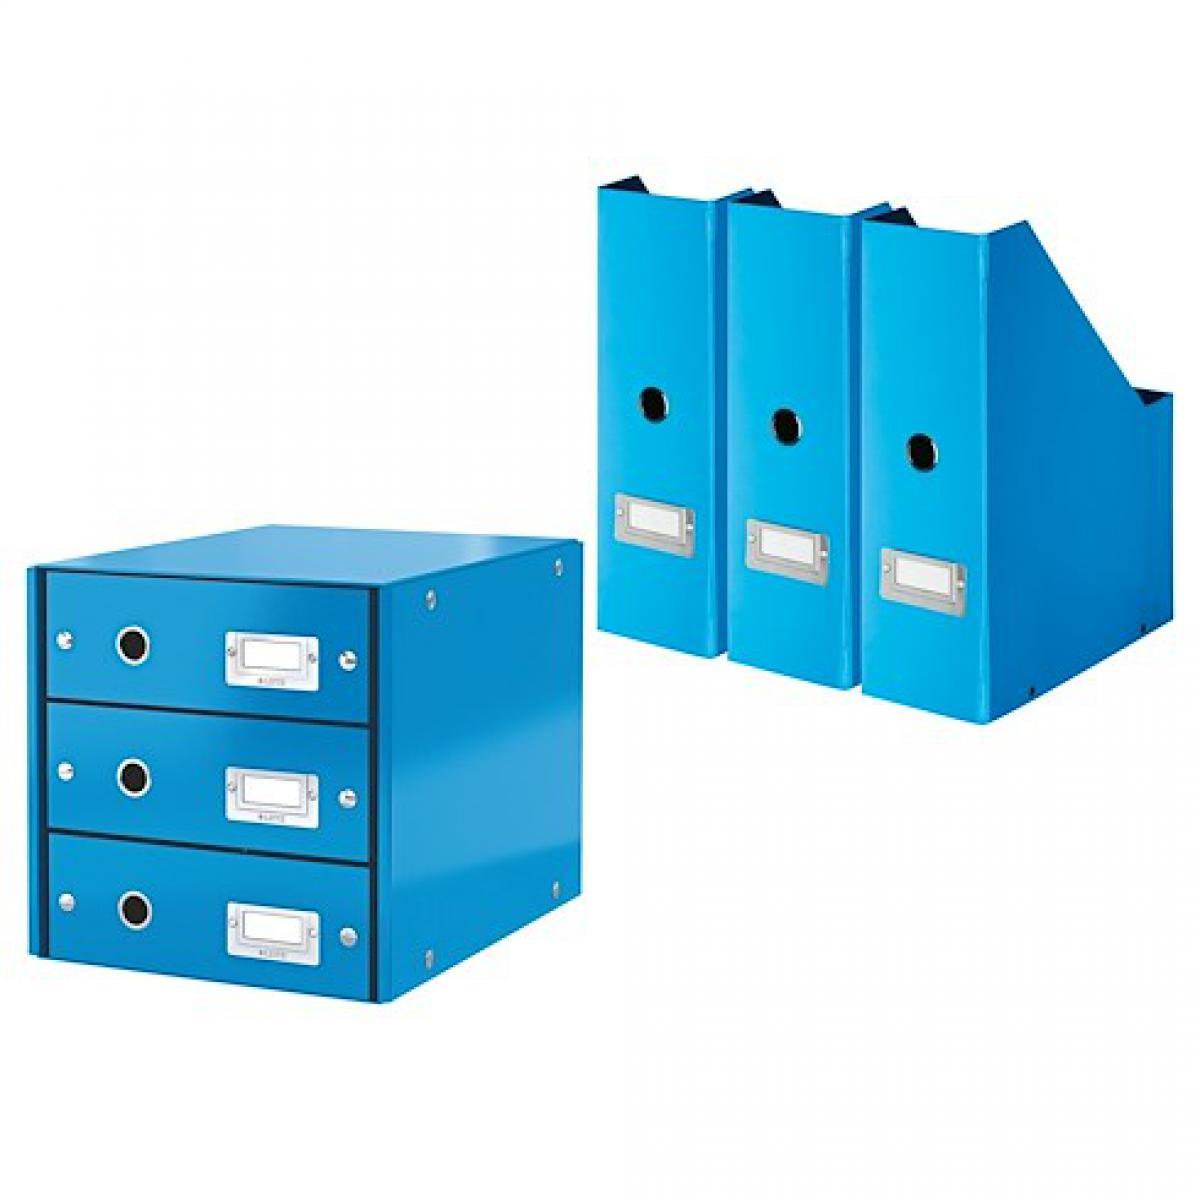 Exacompta Pack module de classement + 3 range-revues Exacompta Offissimo bleus